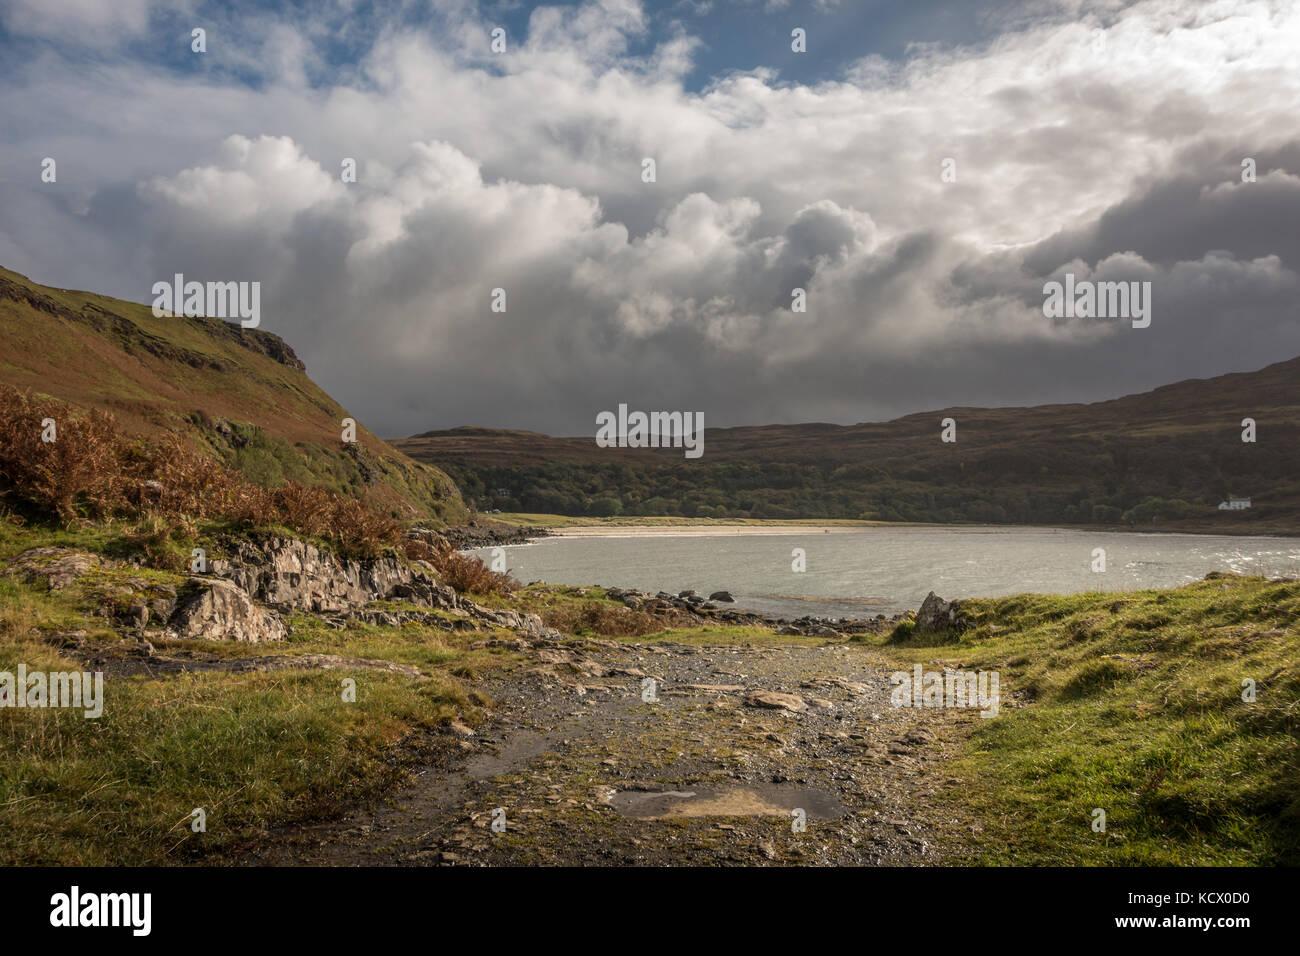 Moody sky and sunshine over Calgary Bay in autumn, Isle of Mull, Scotland - Stock Image